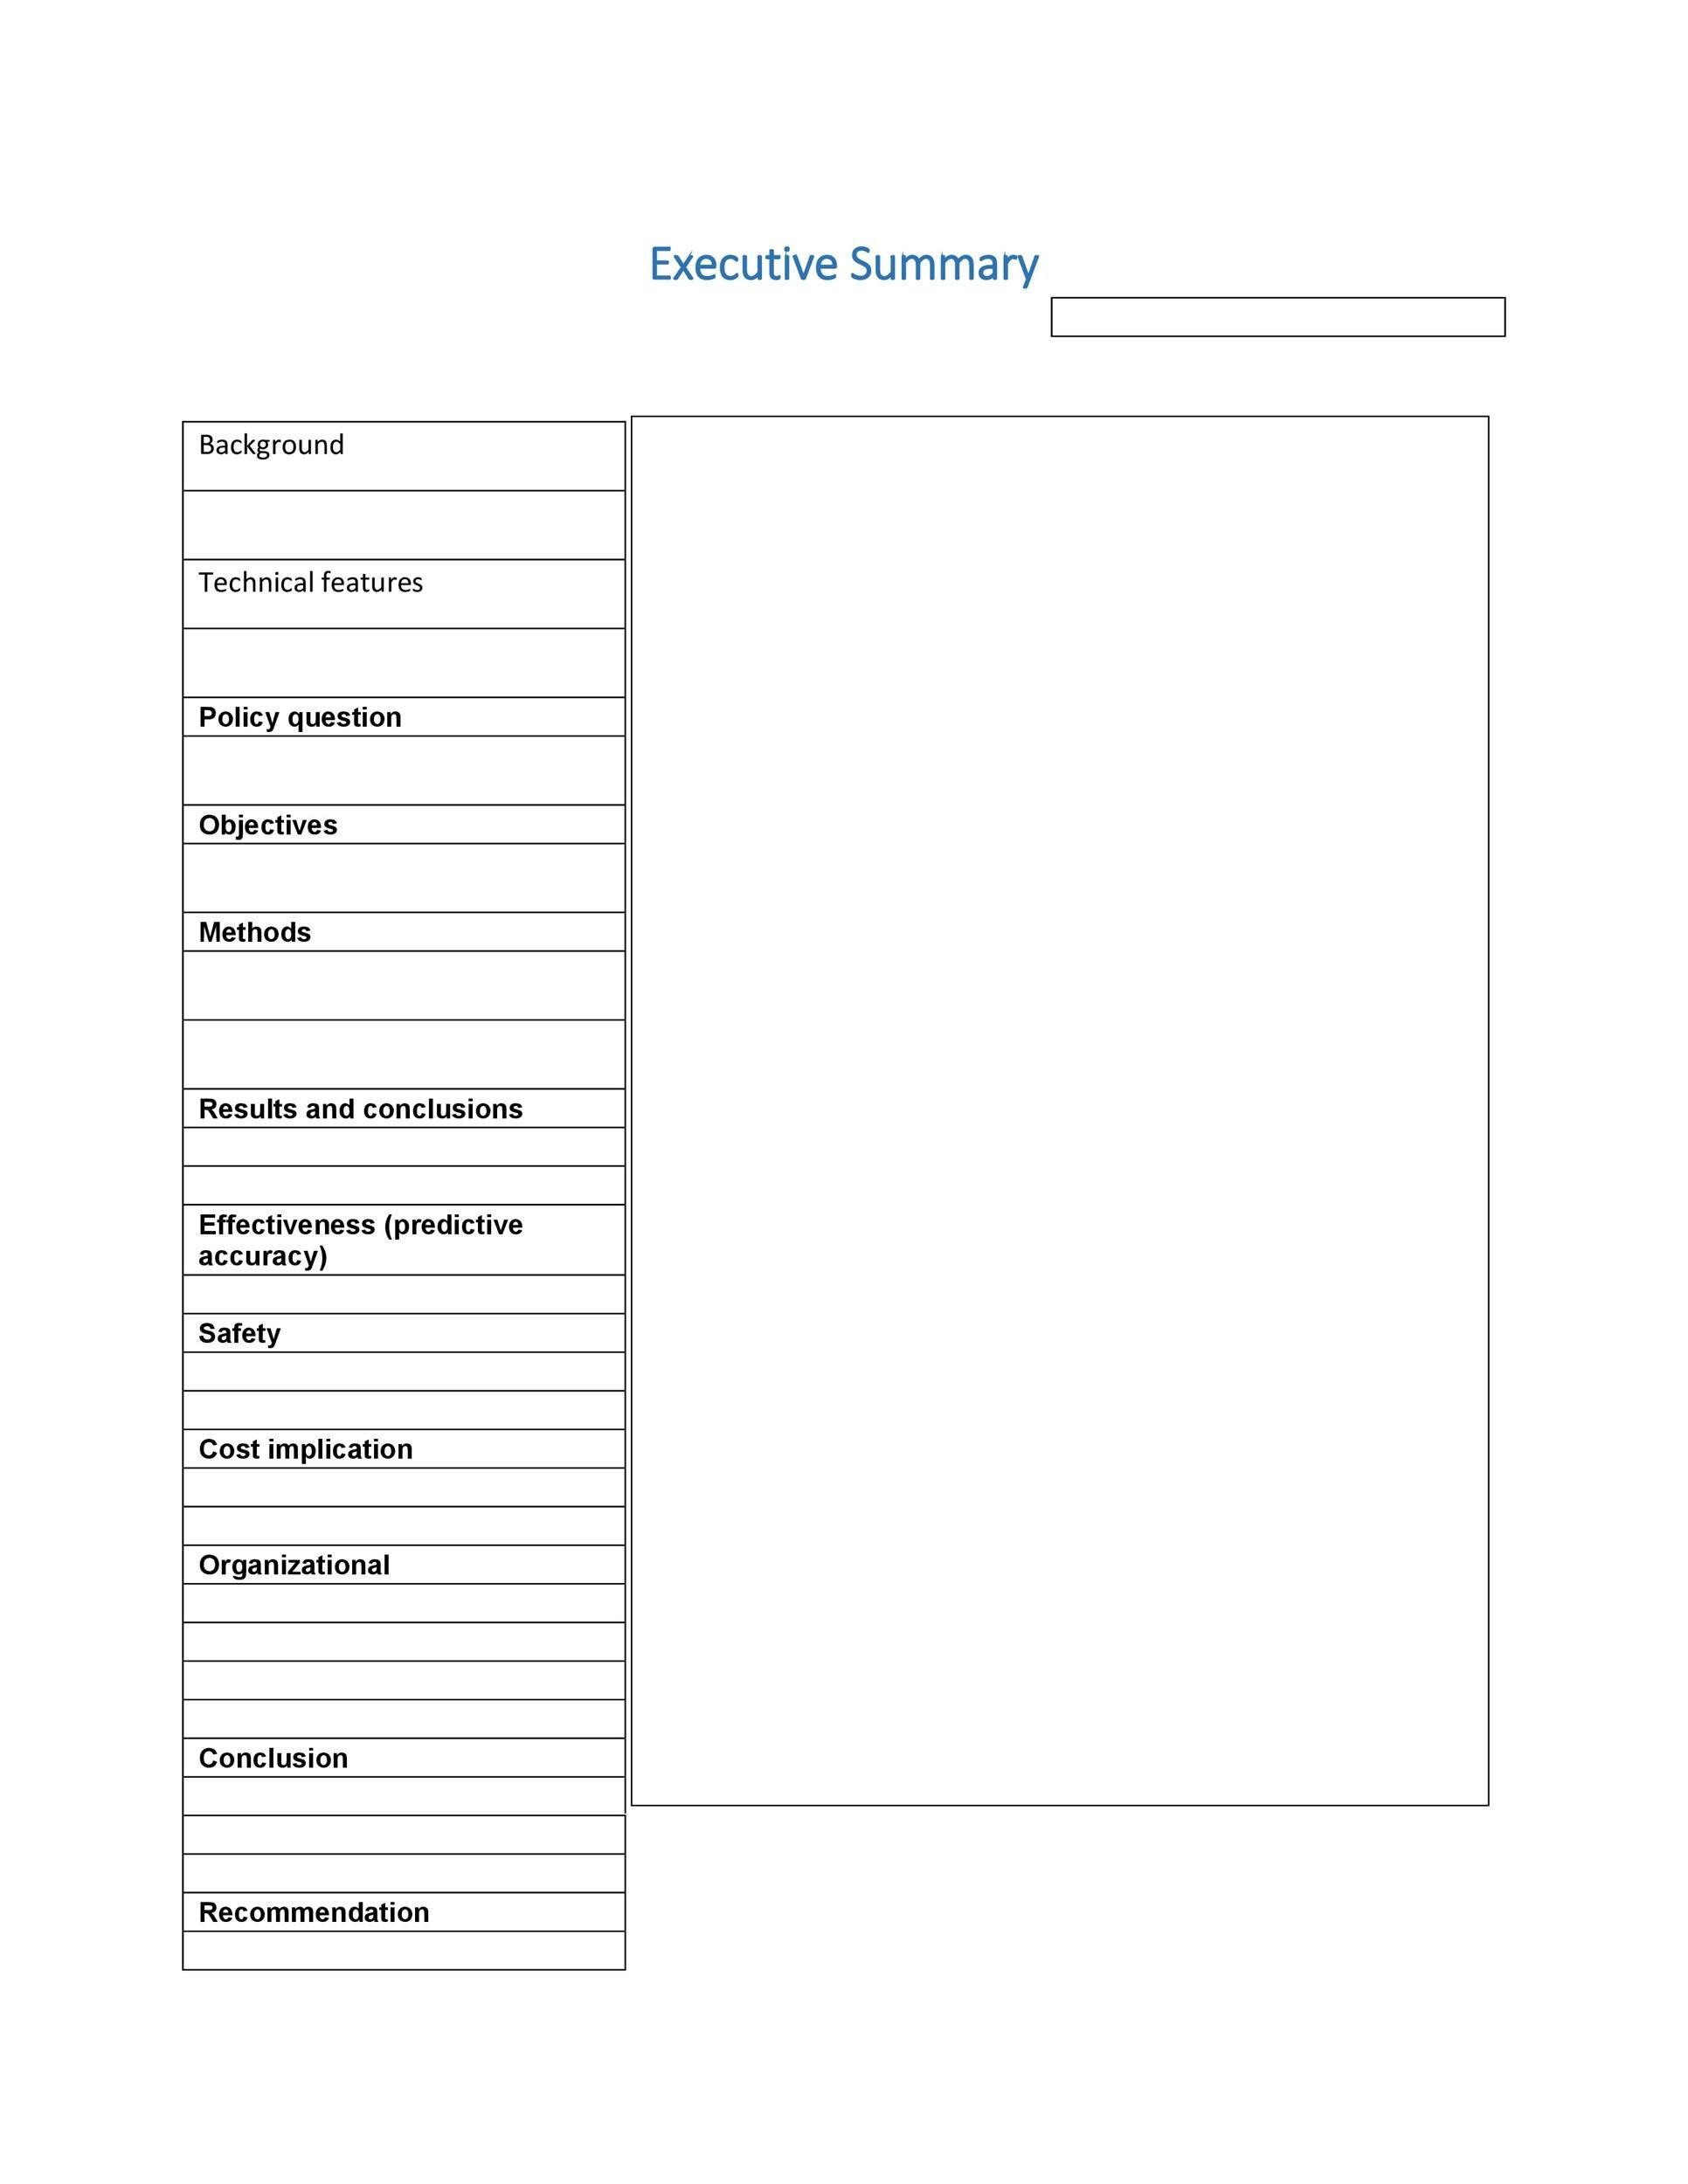 Free Executive Summary Template 20